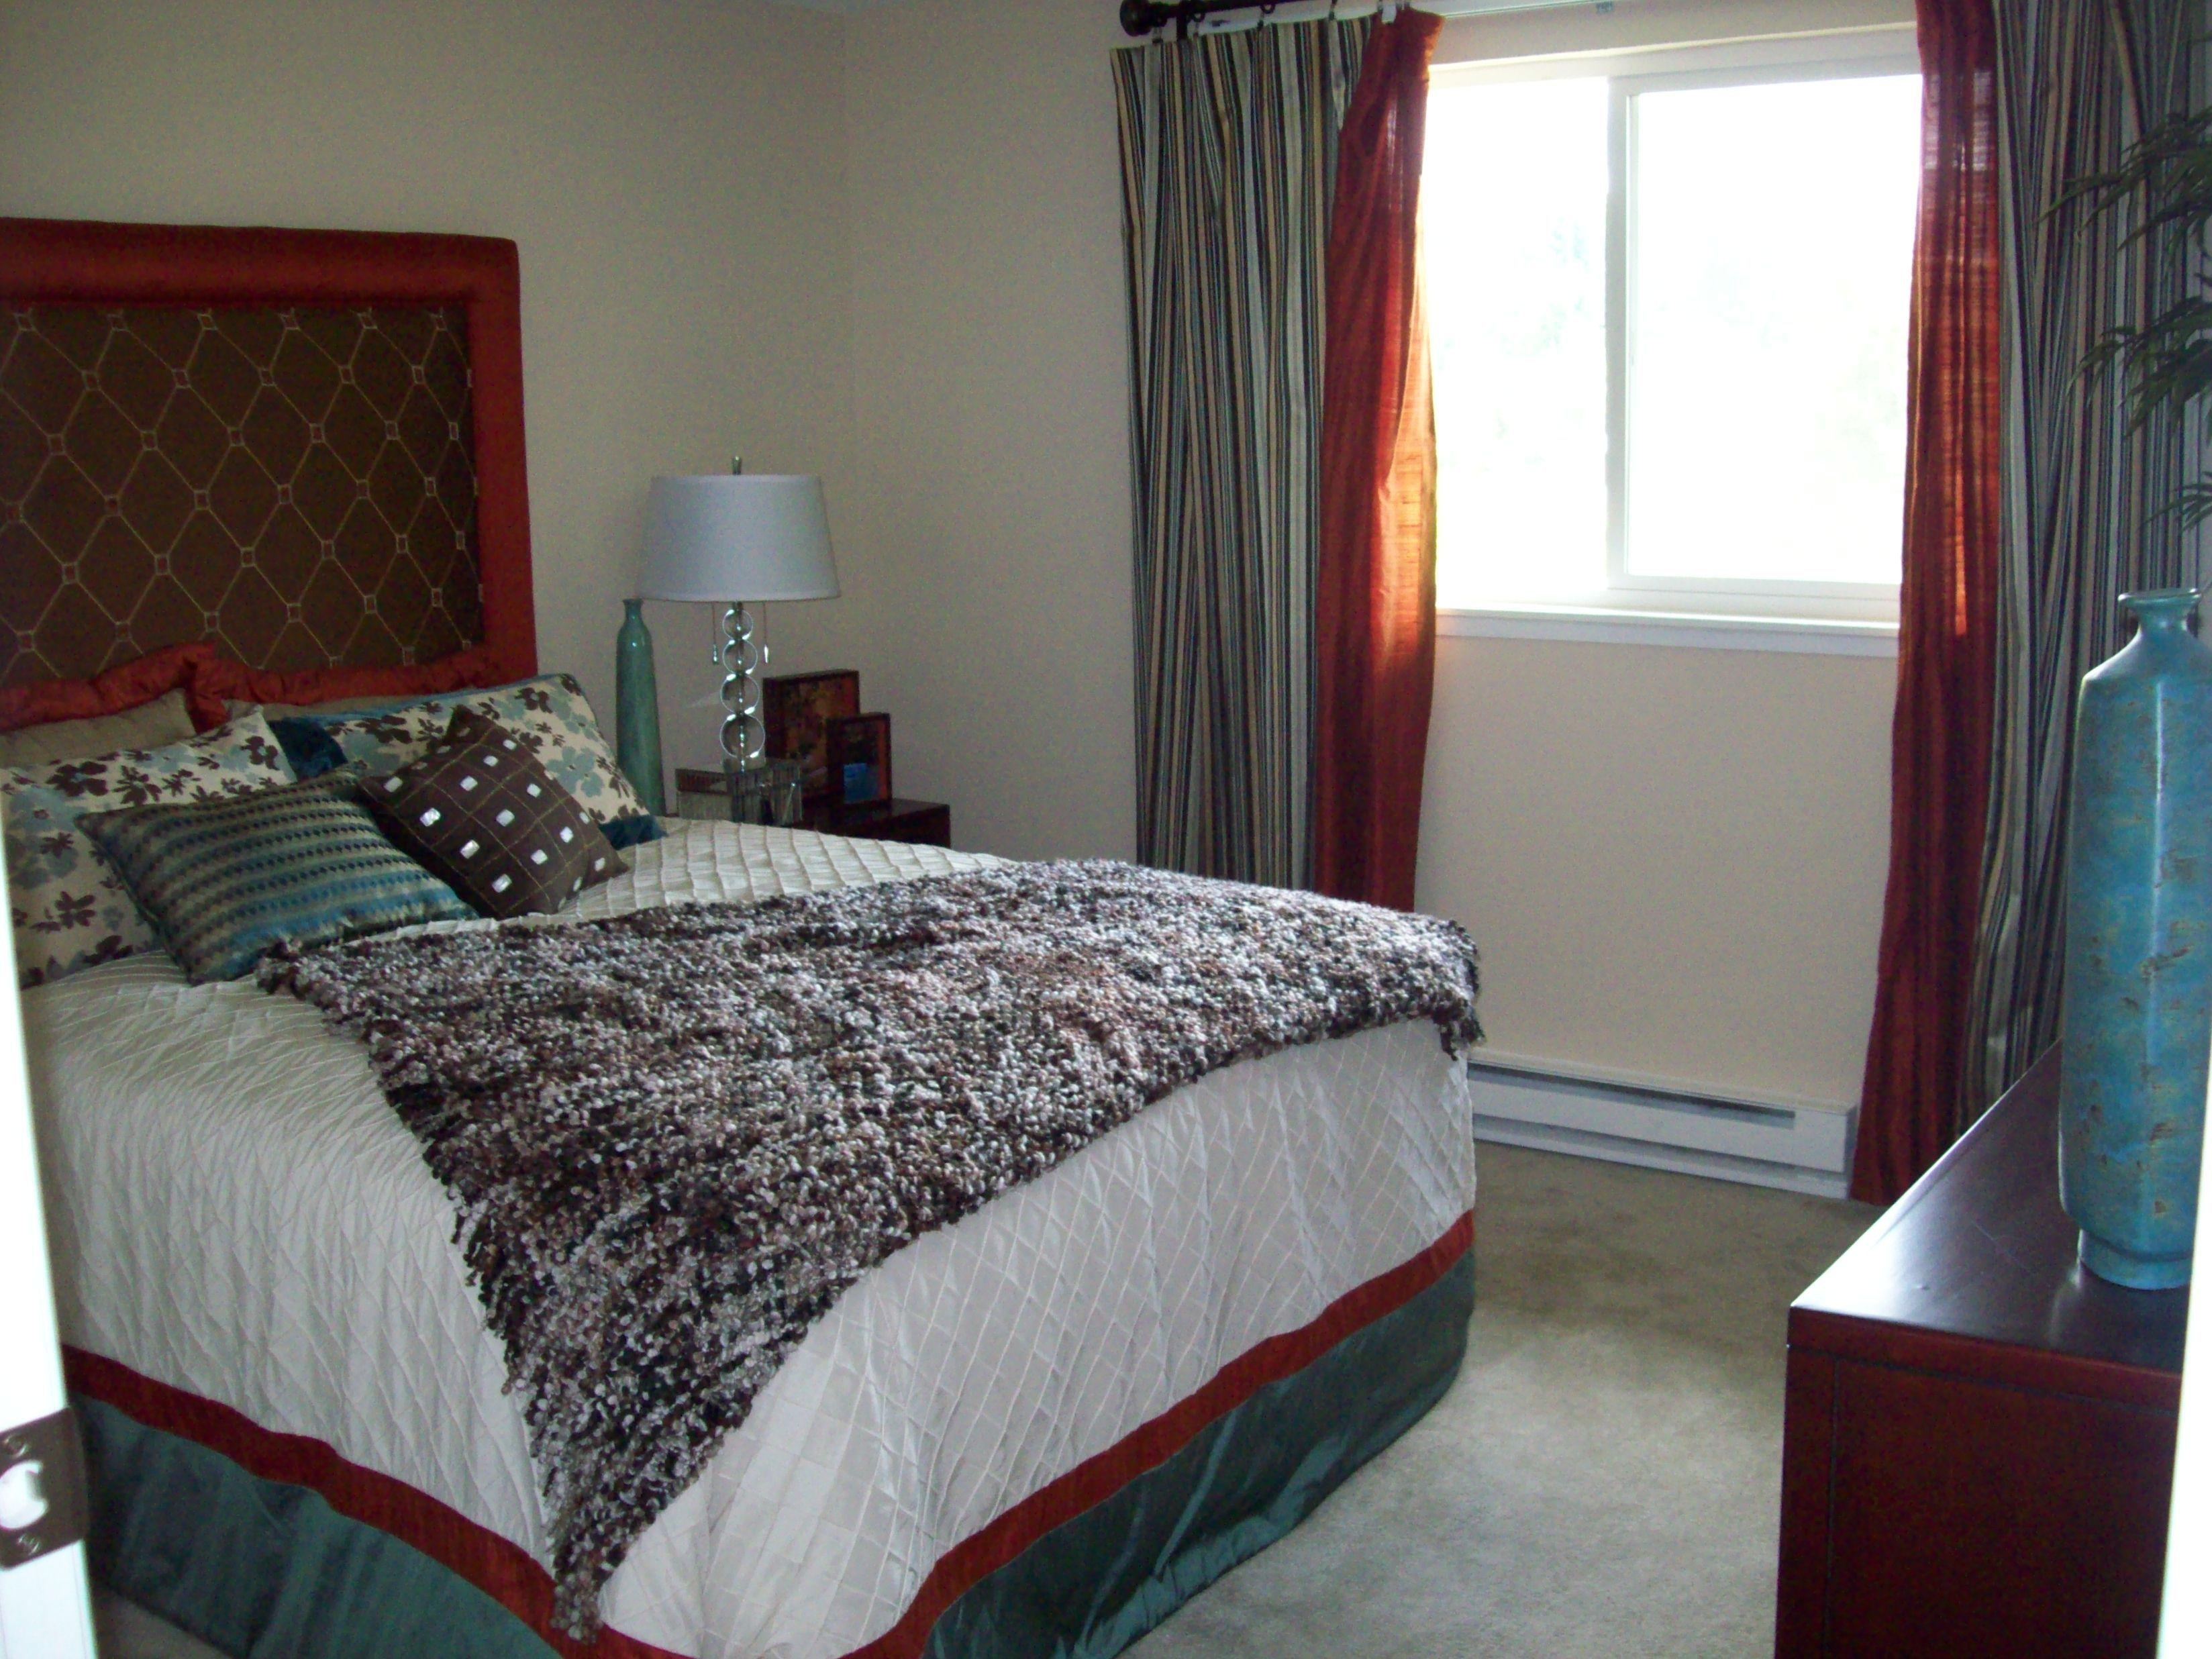 Cascade Onebedroom, One Bath 644 sq. feet Bedroom